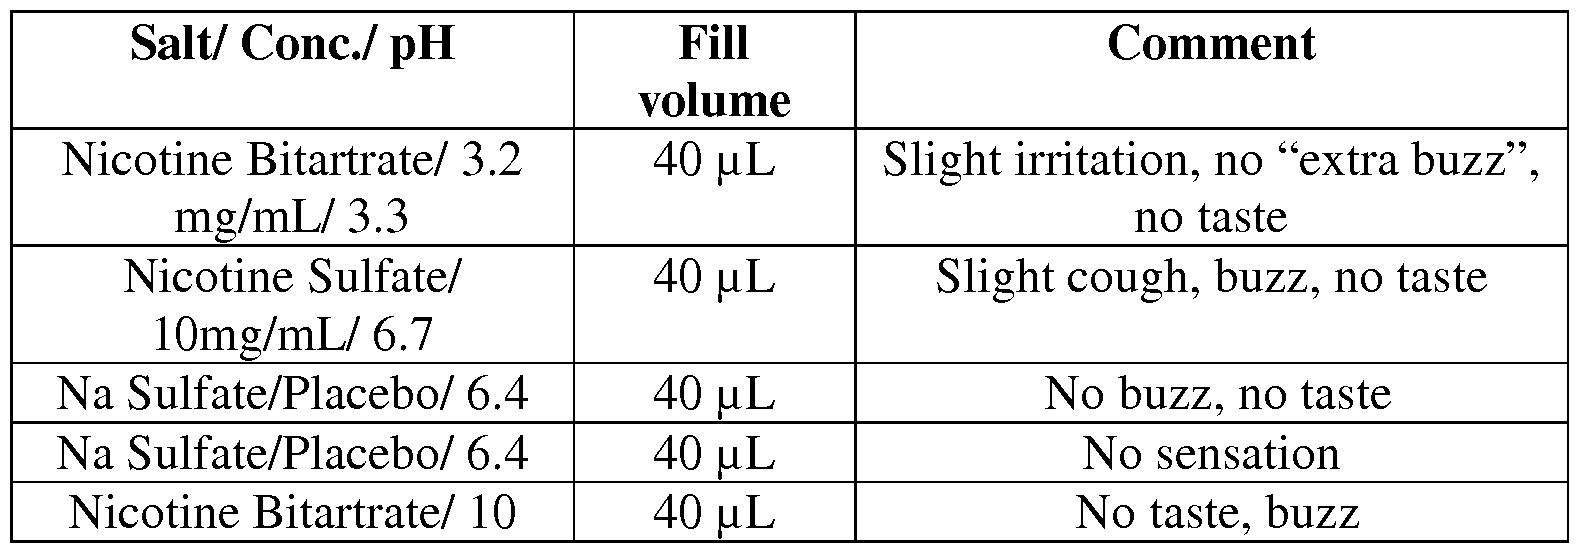 WO2014150245A1 - Methods for inhalation of smoke-free